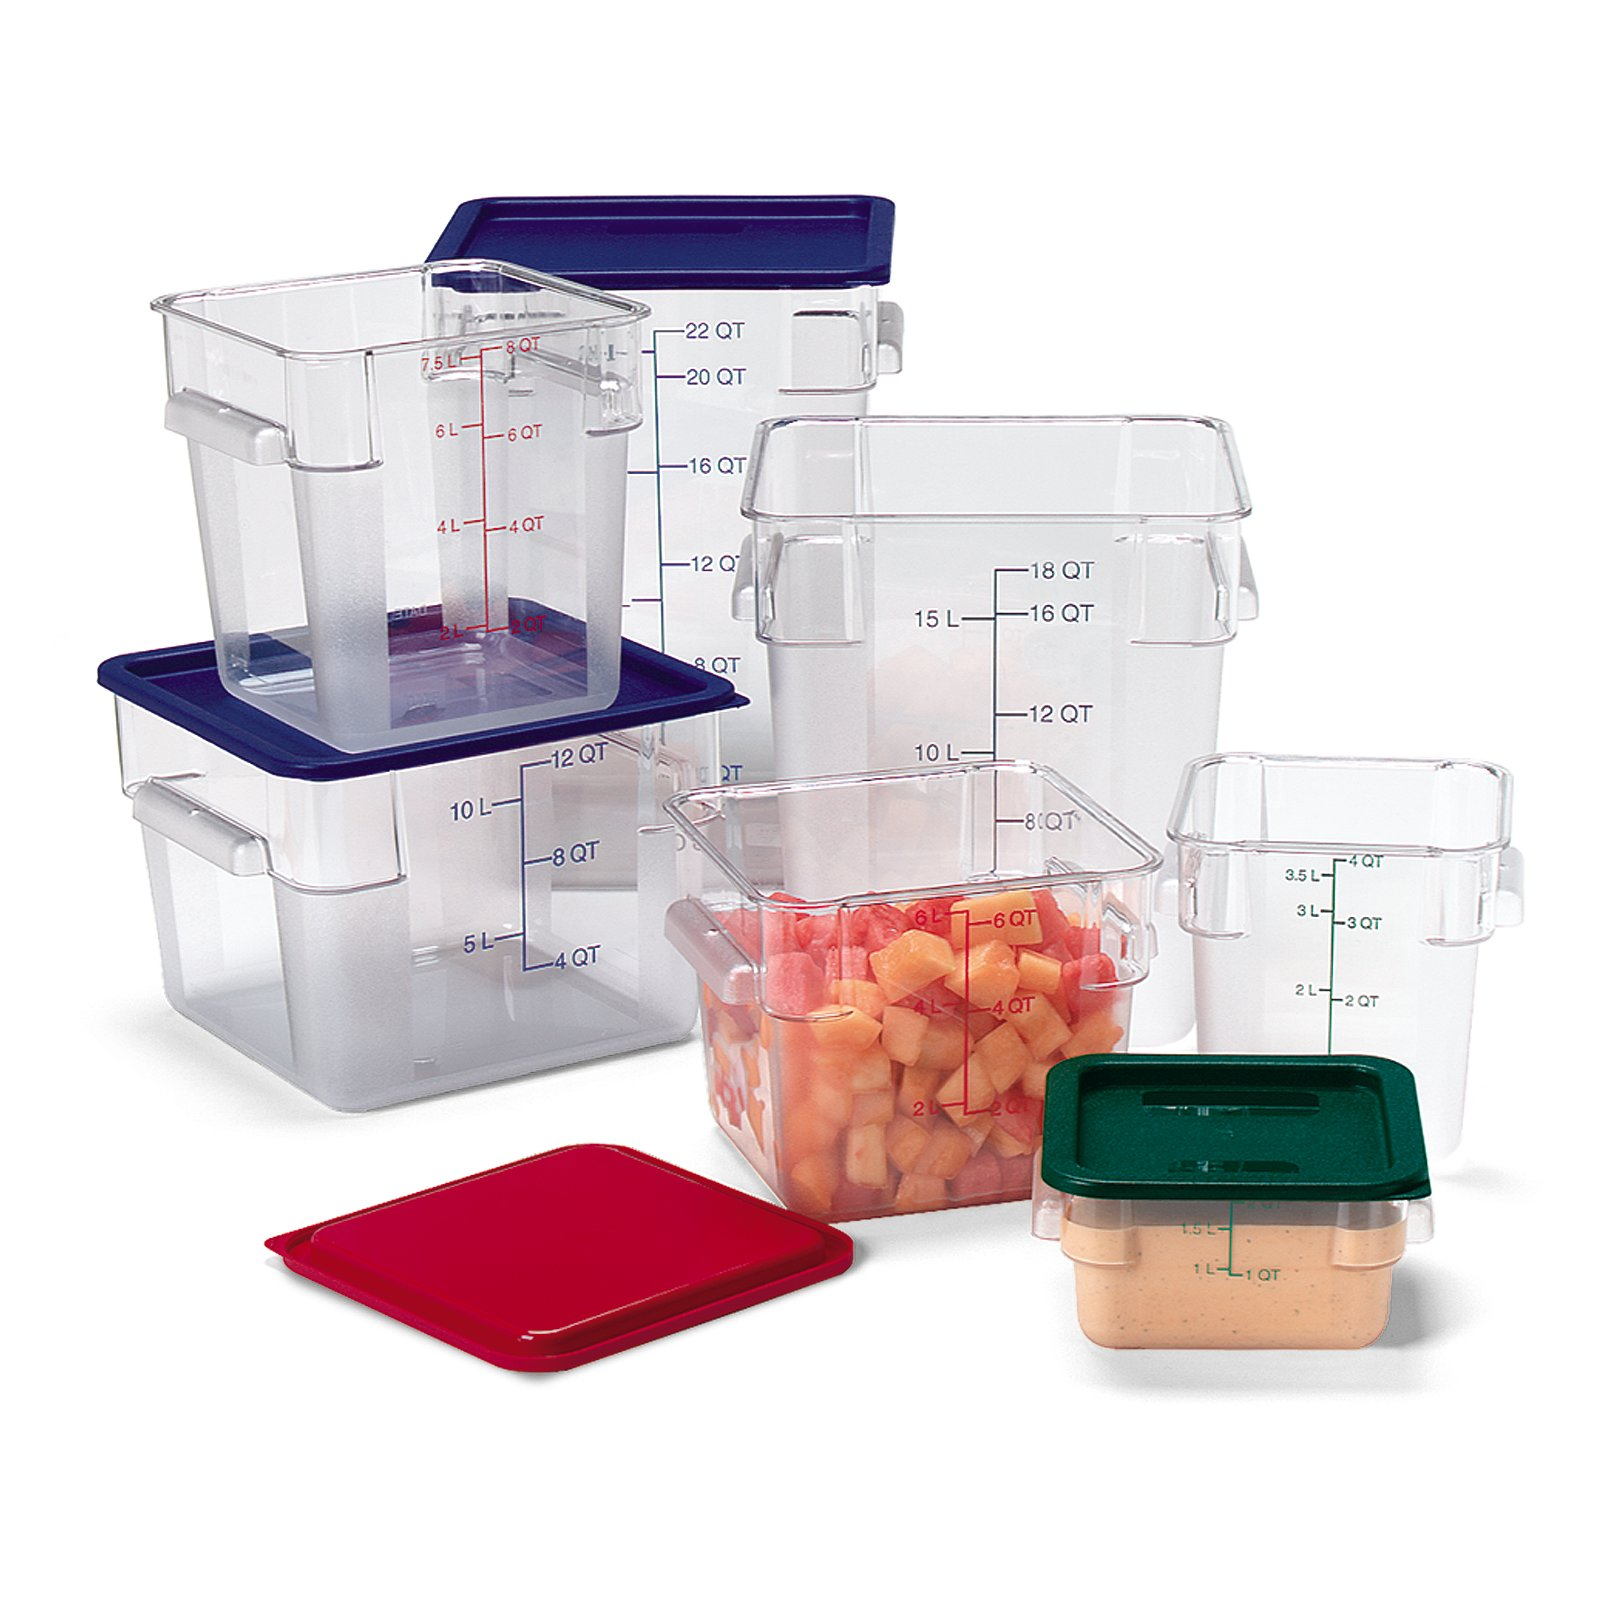 ... 1072107 - StorPlus Polycarbonate Square Food Square Container 4 qt -  Clear